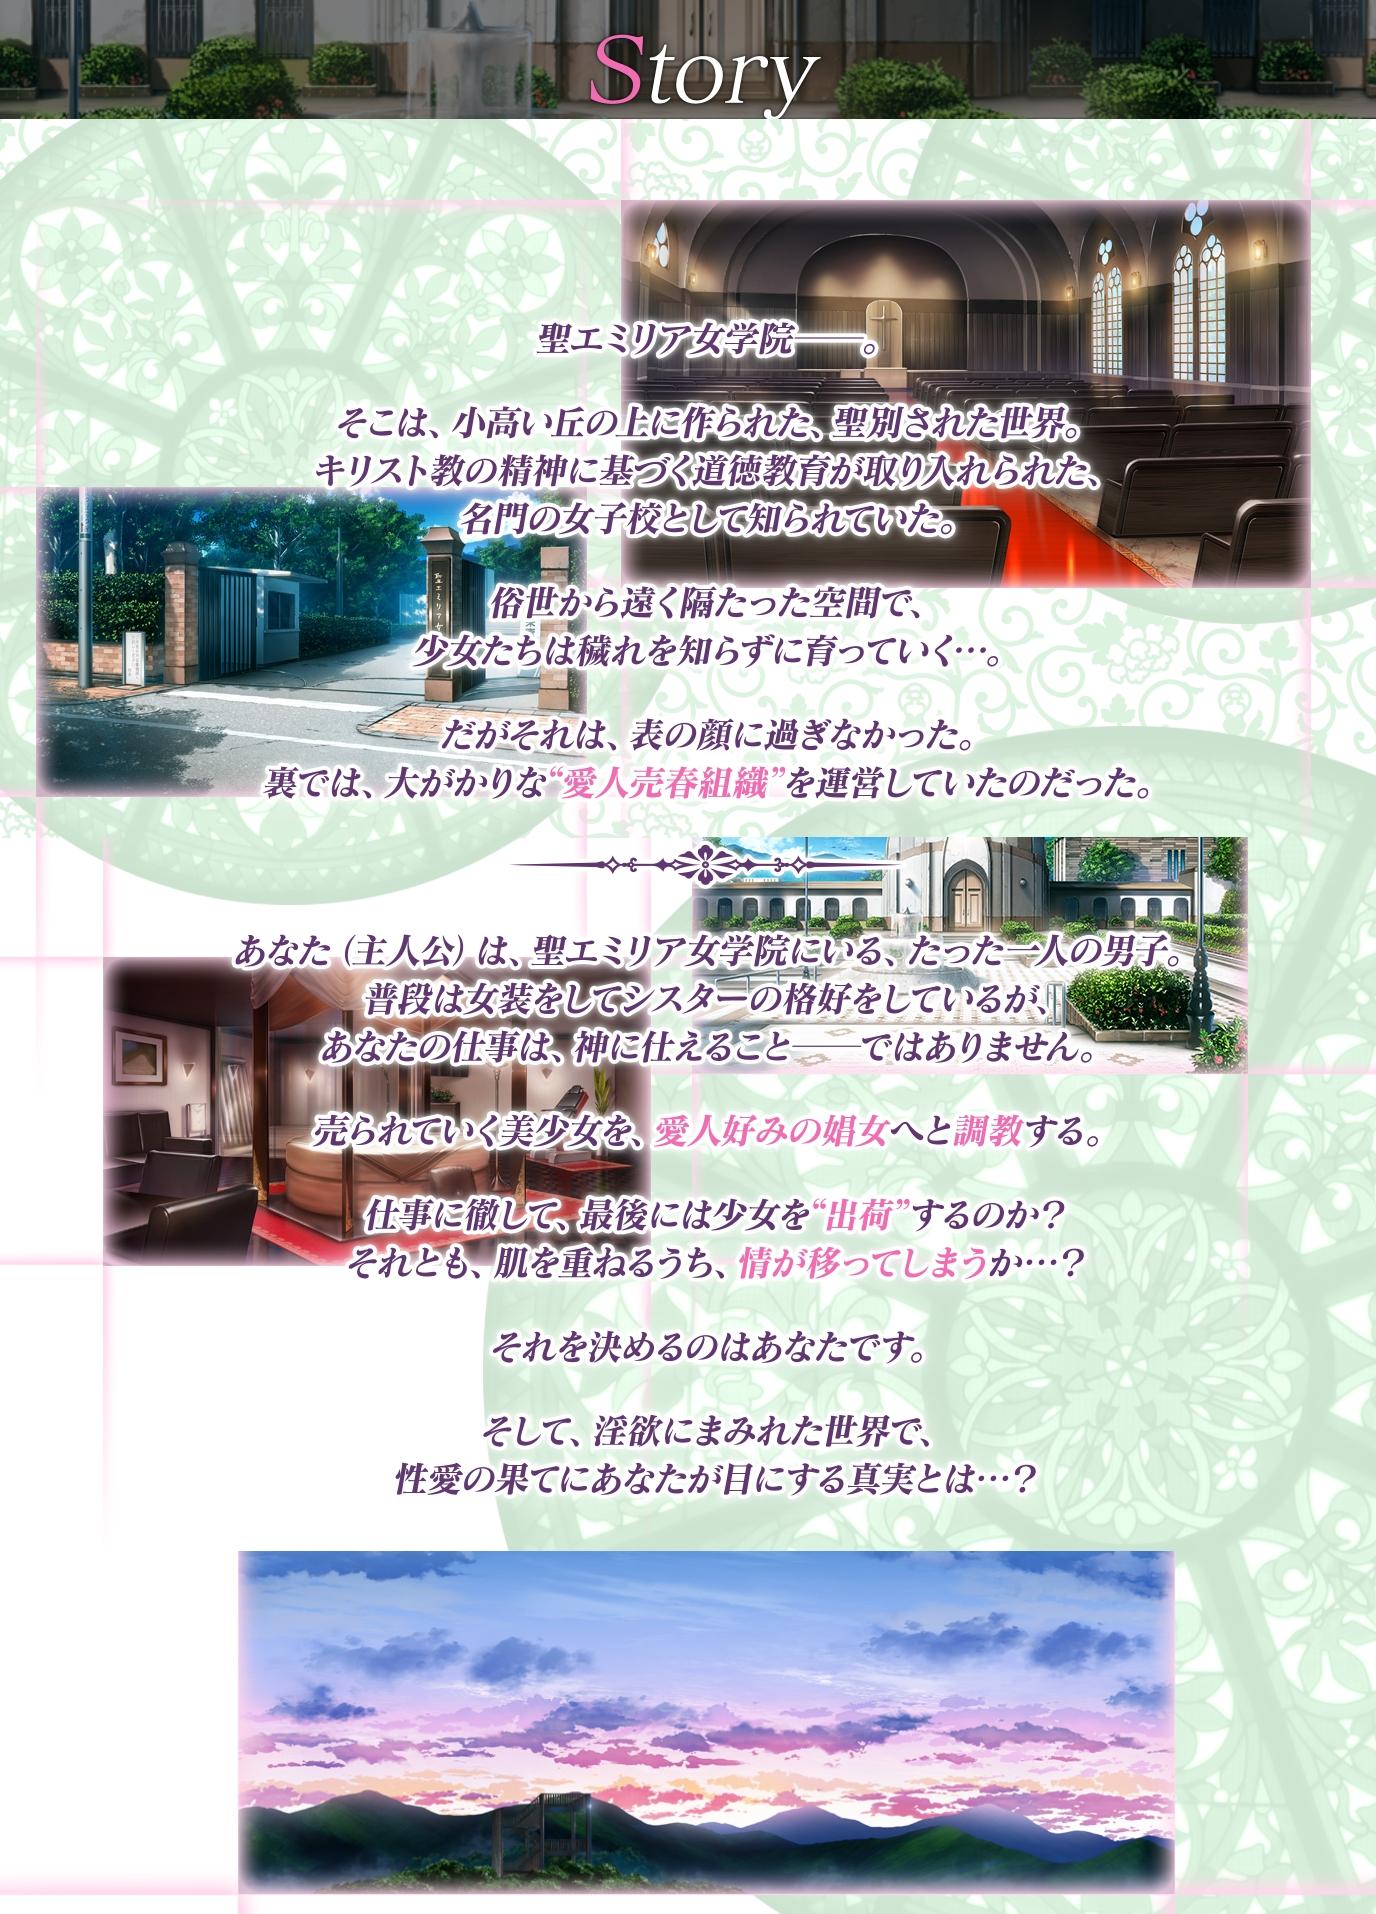 story_2020111920023675a.jpg